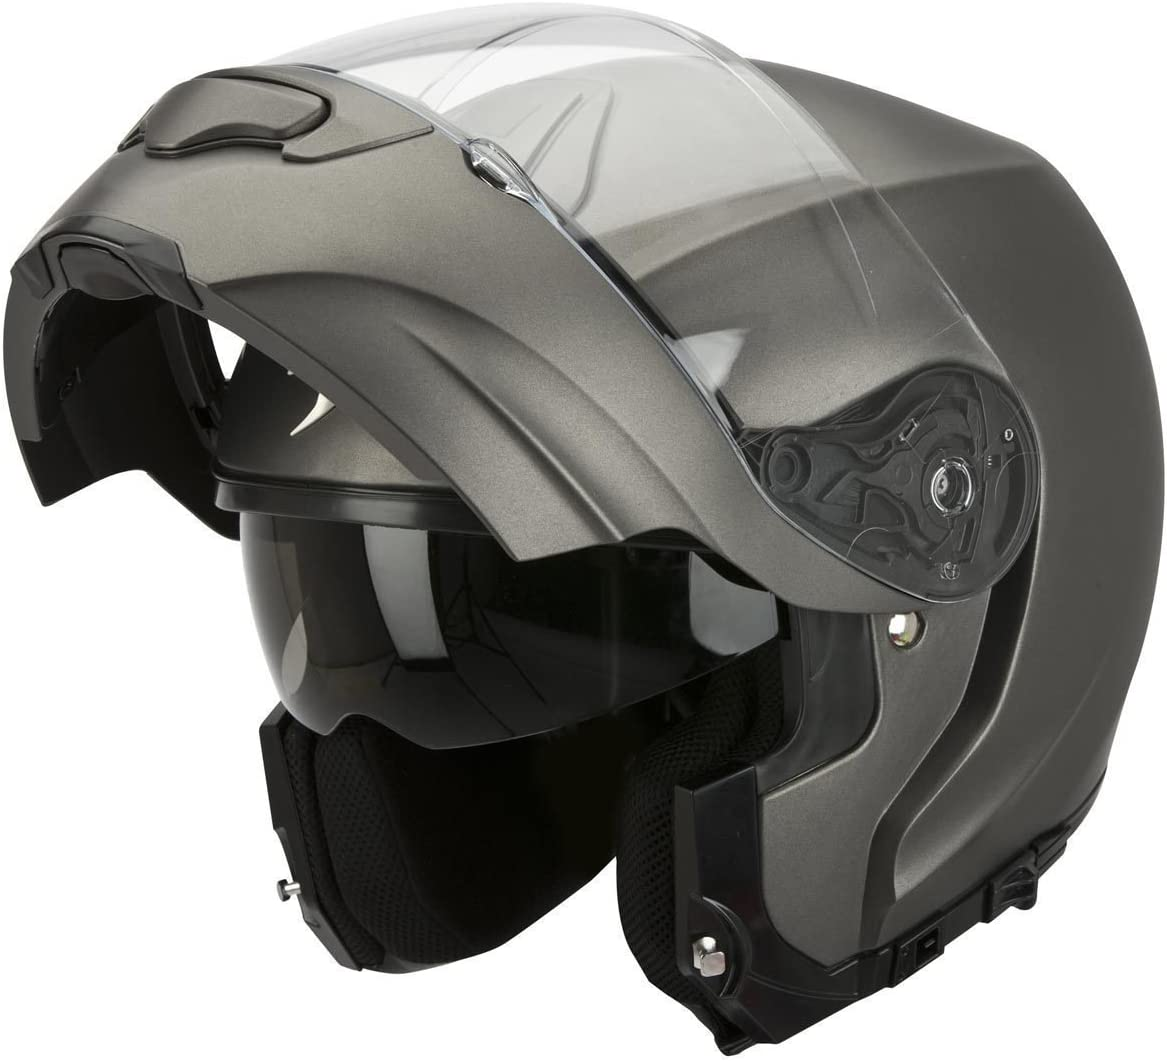 Scorpion Motorradhelm Aus Ultra Tct 63 64 Anthrazit Auto